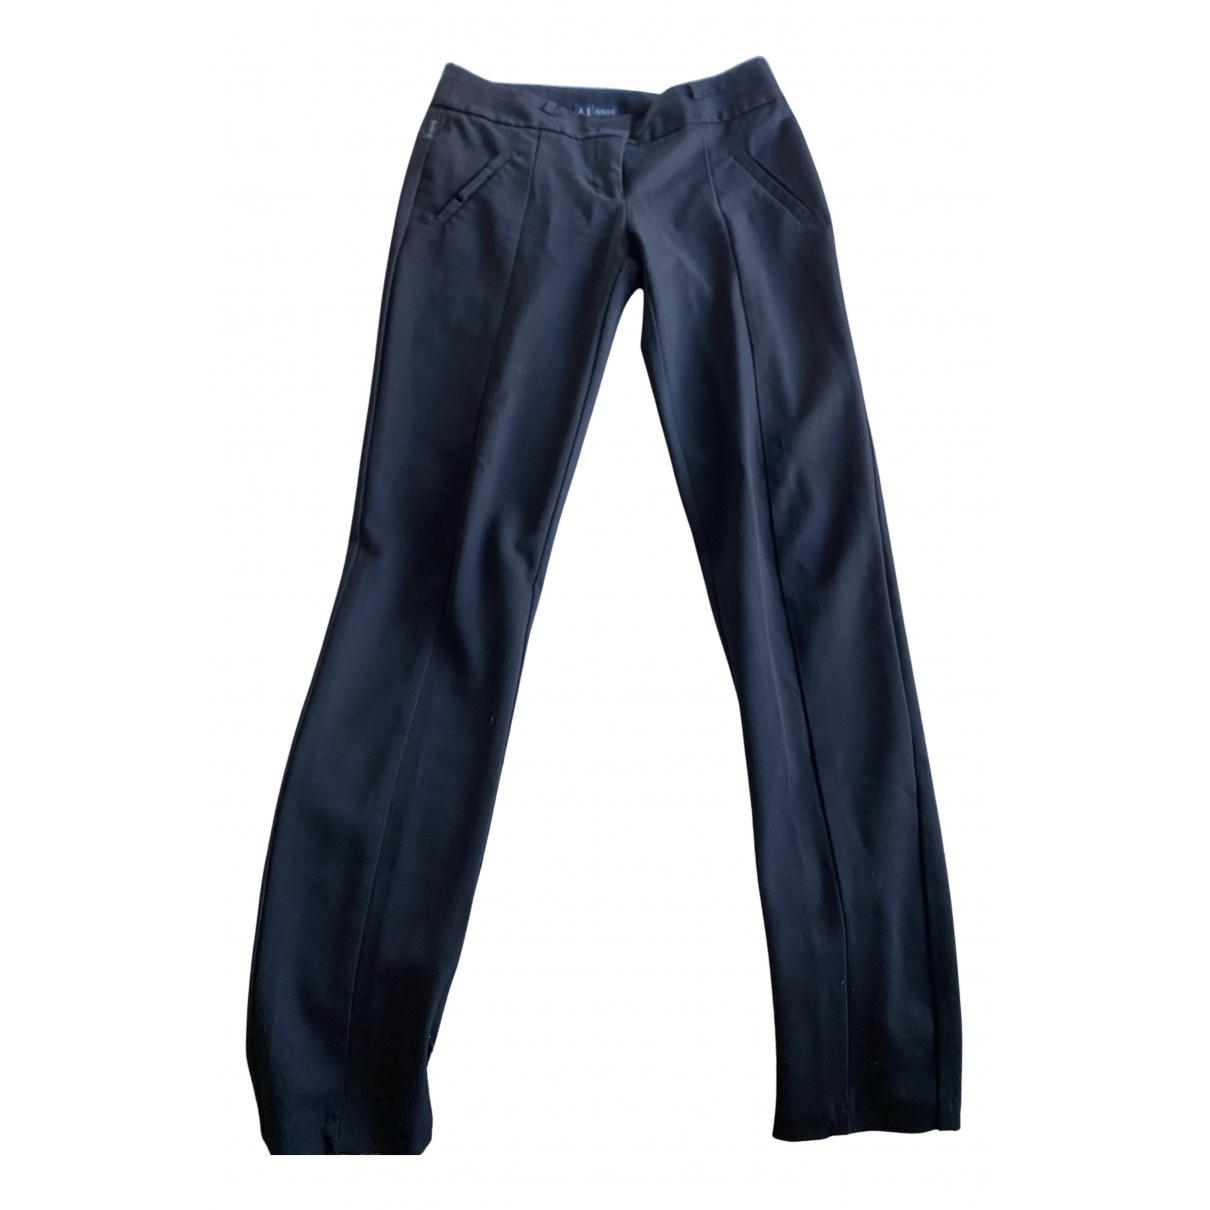 Armani Jeans N Black Trousers for Women 42 FR